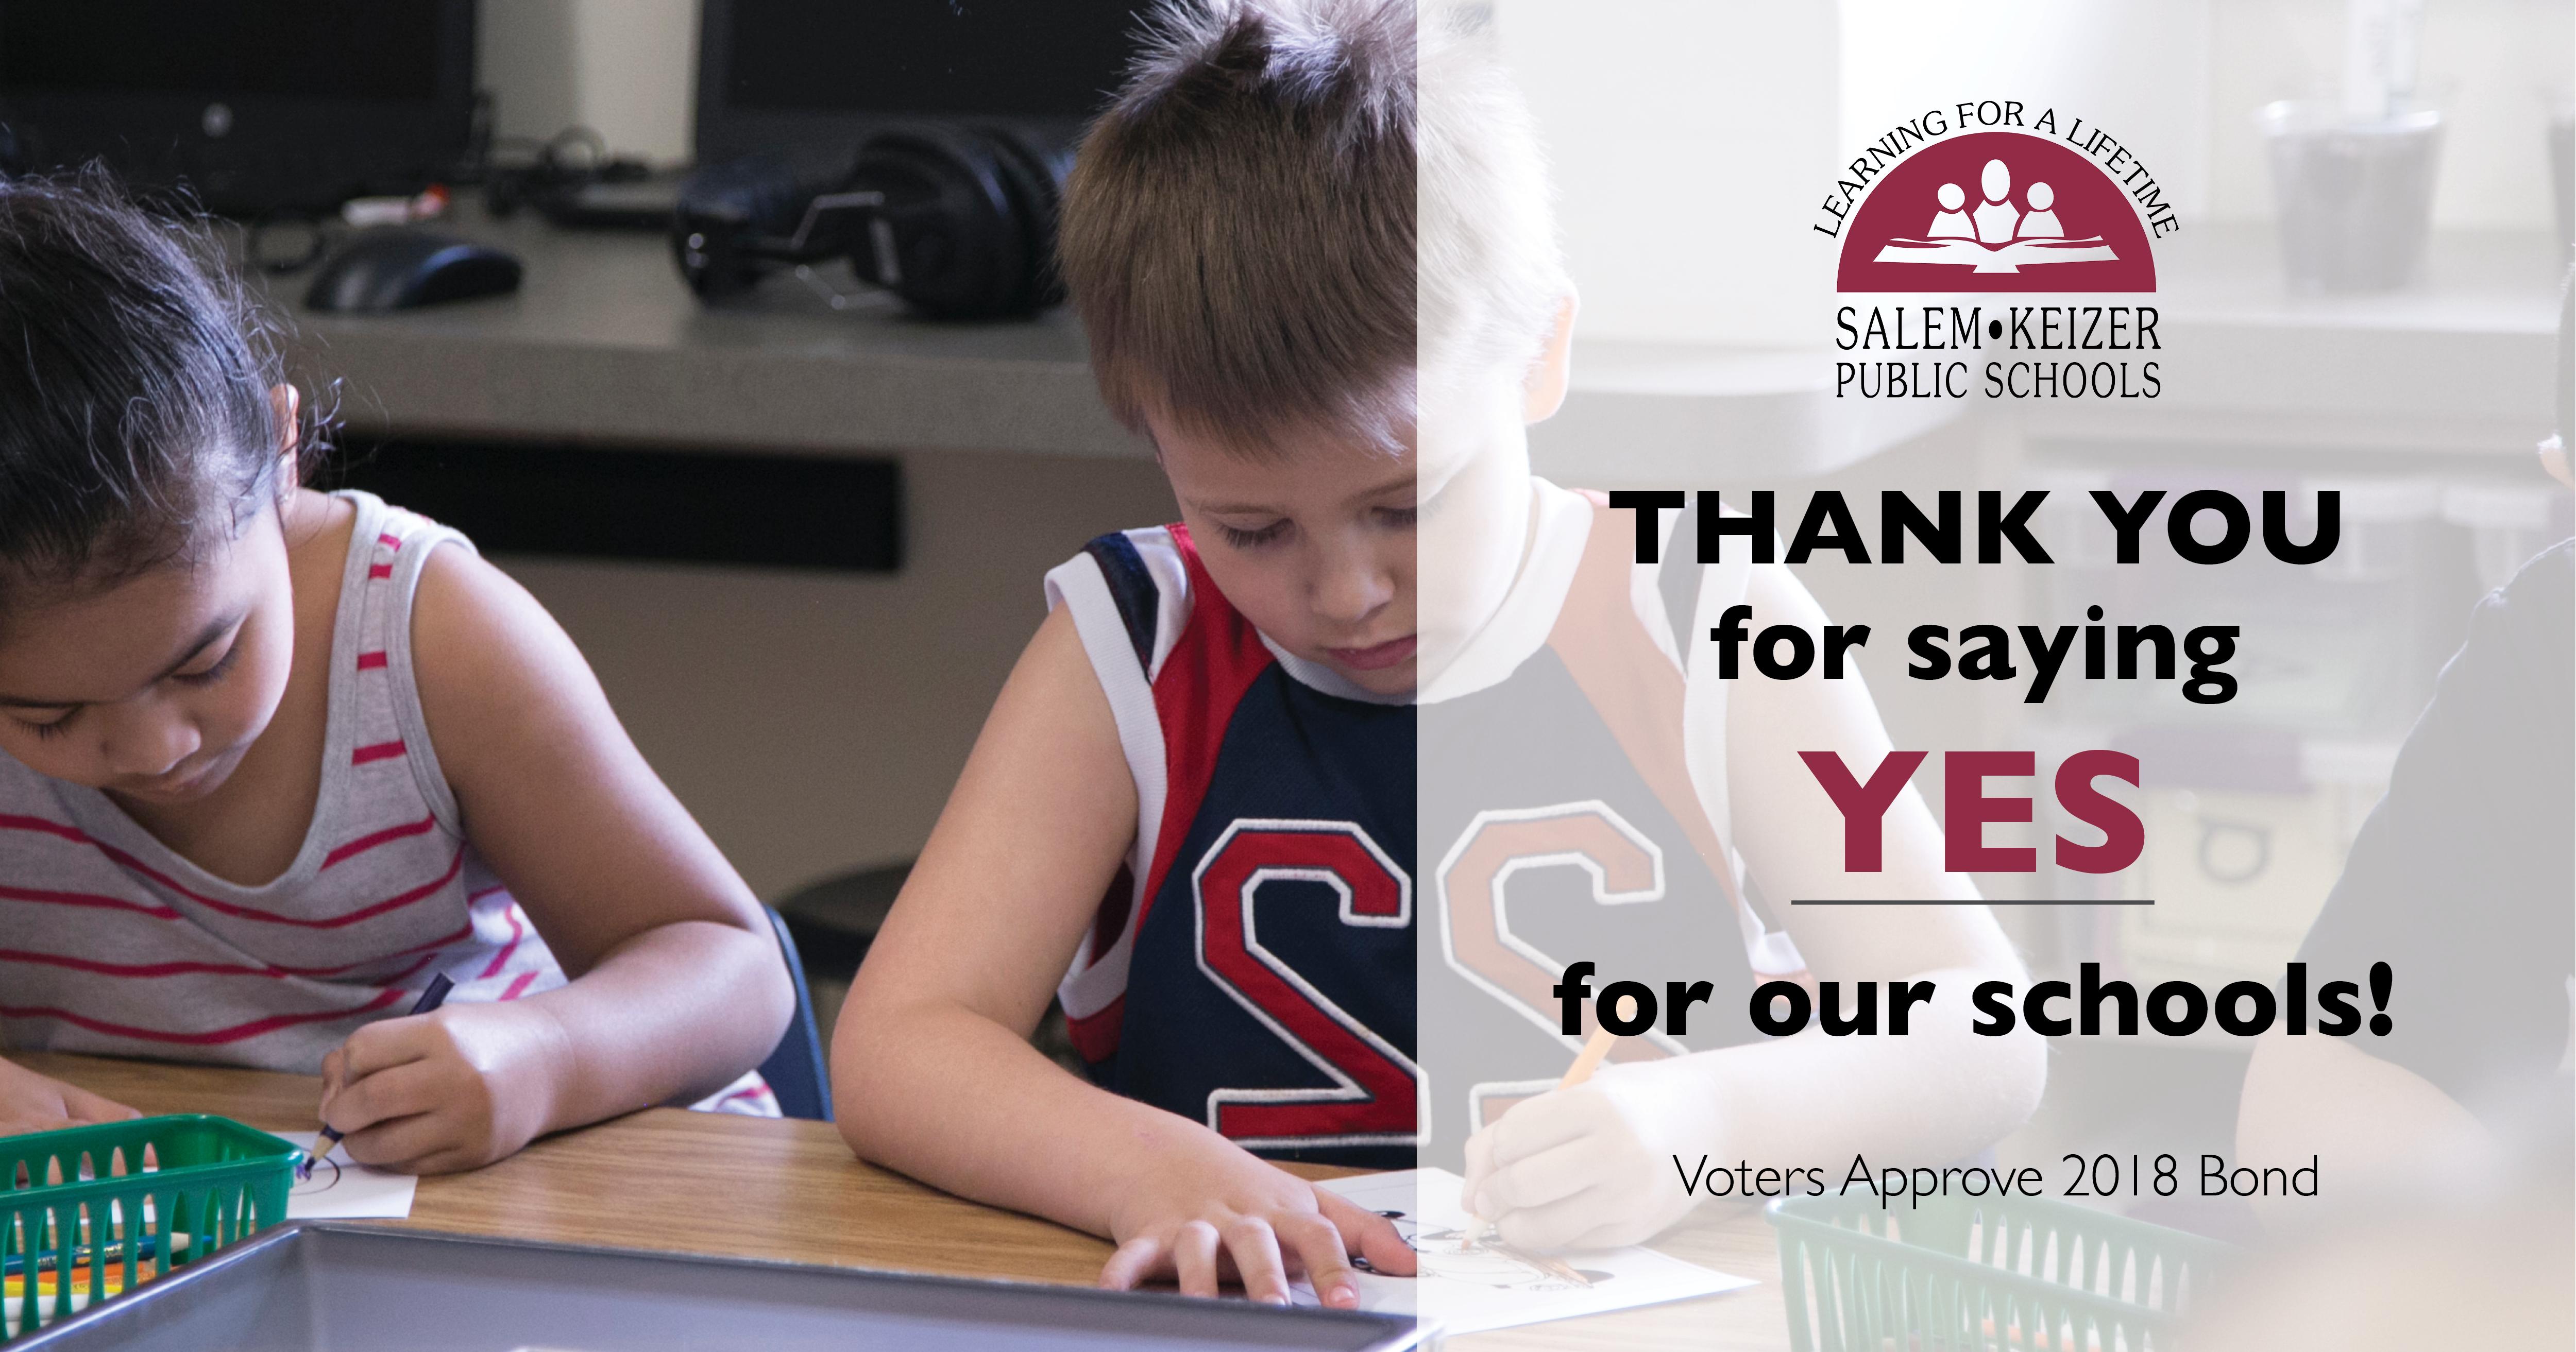 Salem-Keizer Voters Approve $619.7 Million School Bond